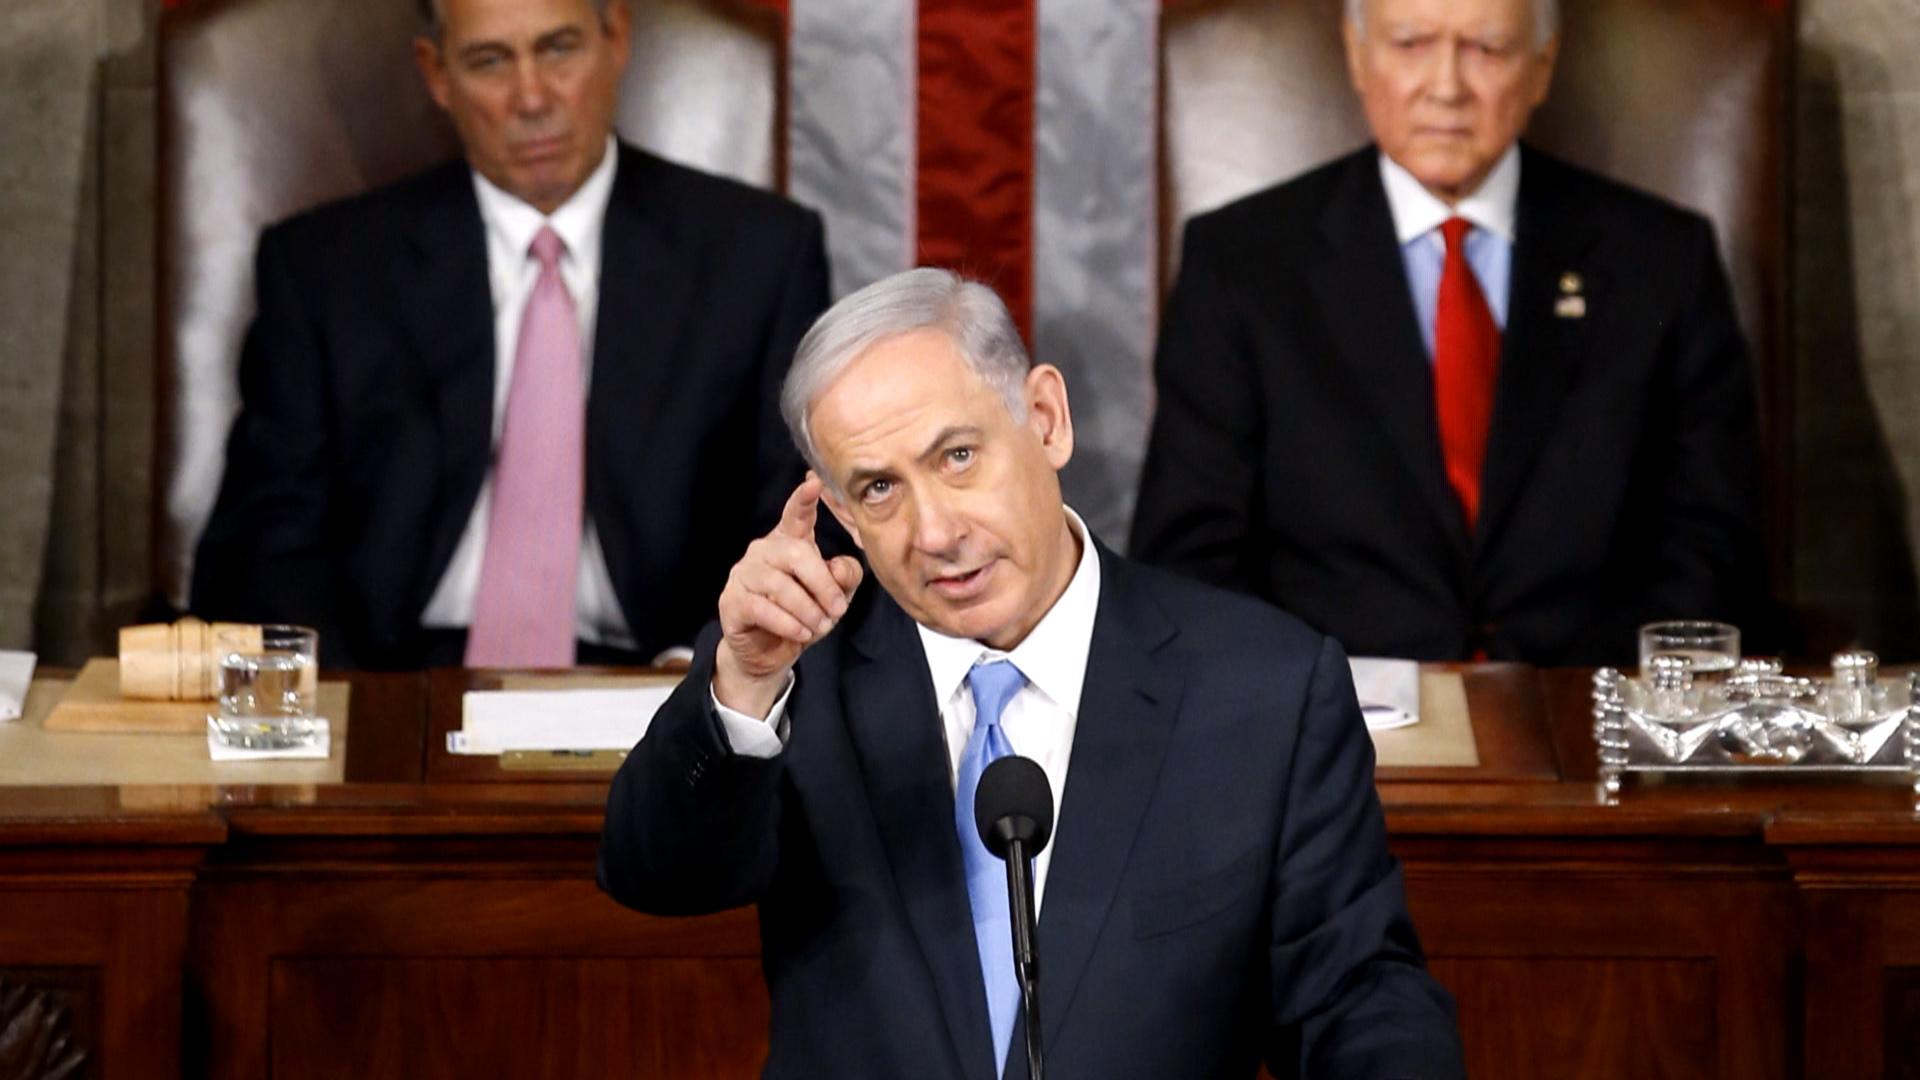 Fallout from Netanyahu speech continues